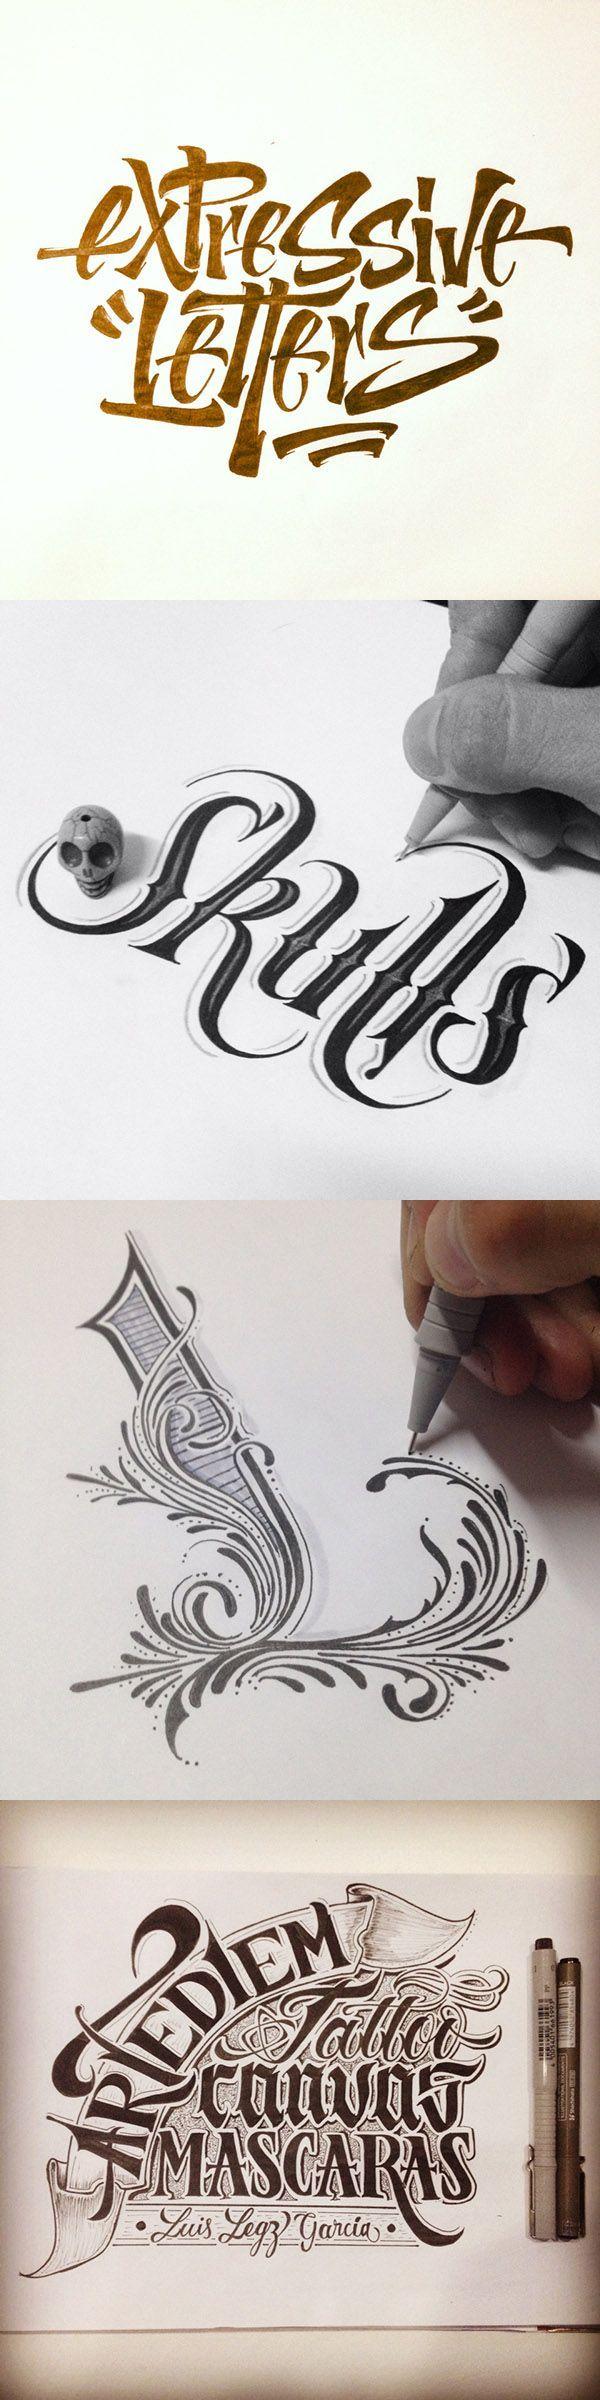 Legz clipart hand By LEGZ Pinterest best #Calligraphy